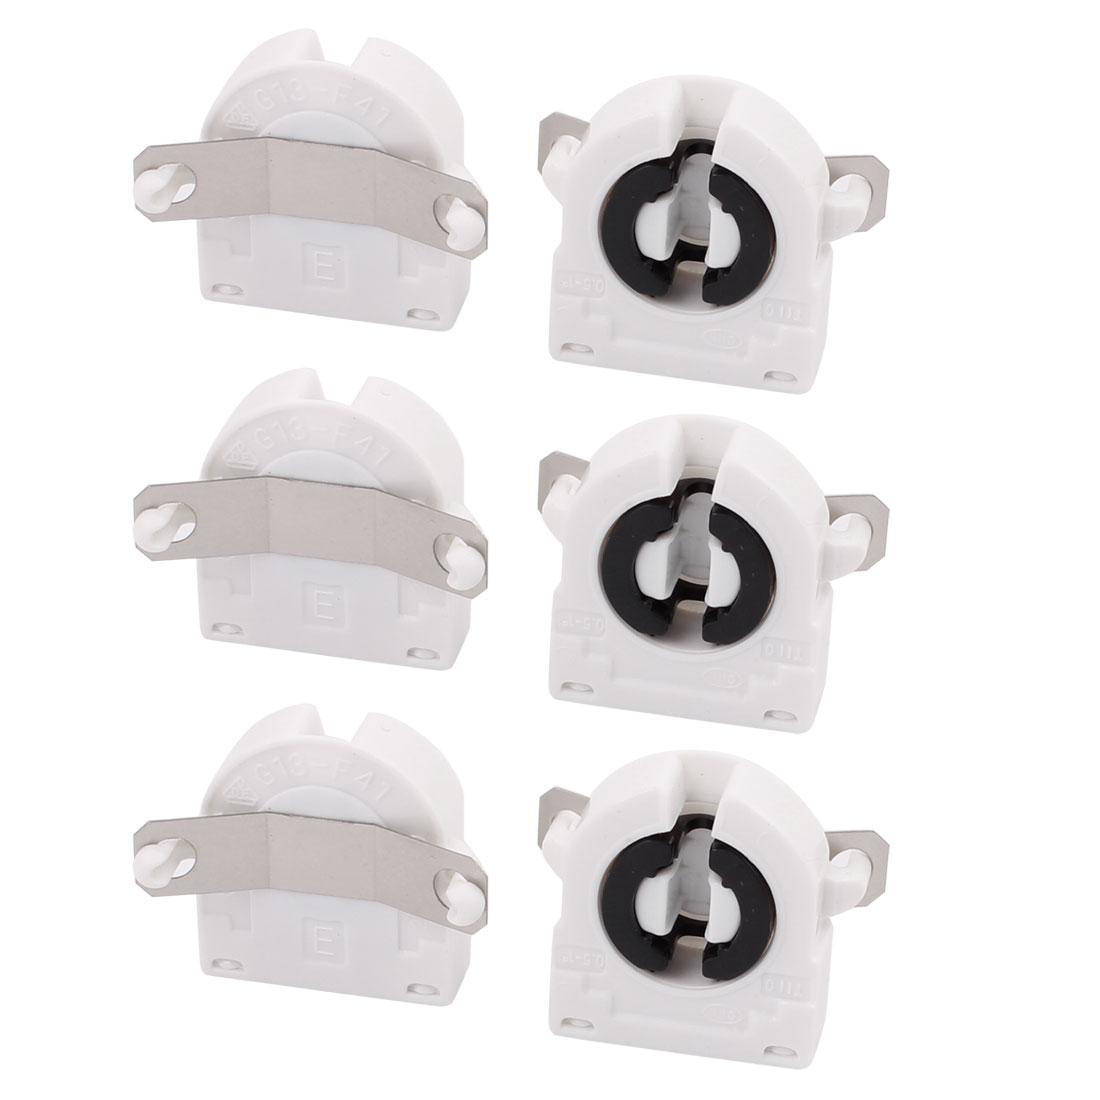 6 Pcs AC500V 2A G13-F41A T8 Light Socket G13 Base Fluorescent Lamp Holder White